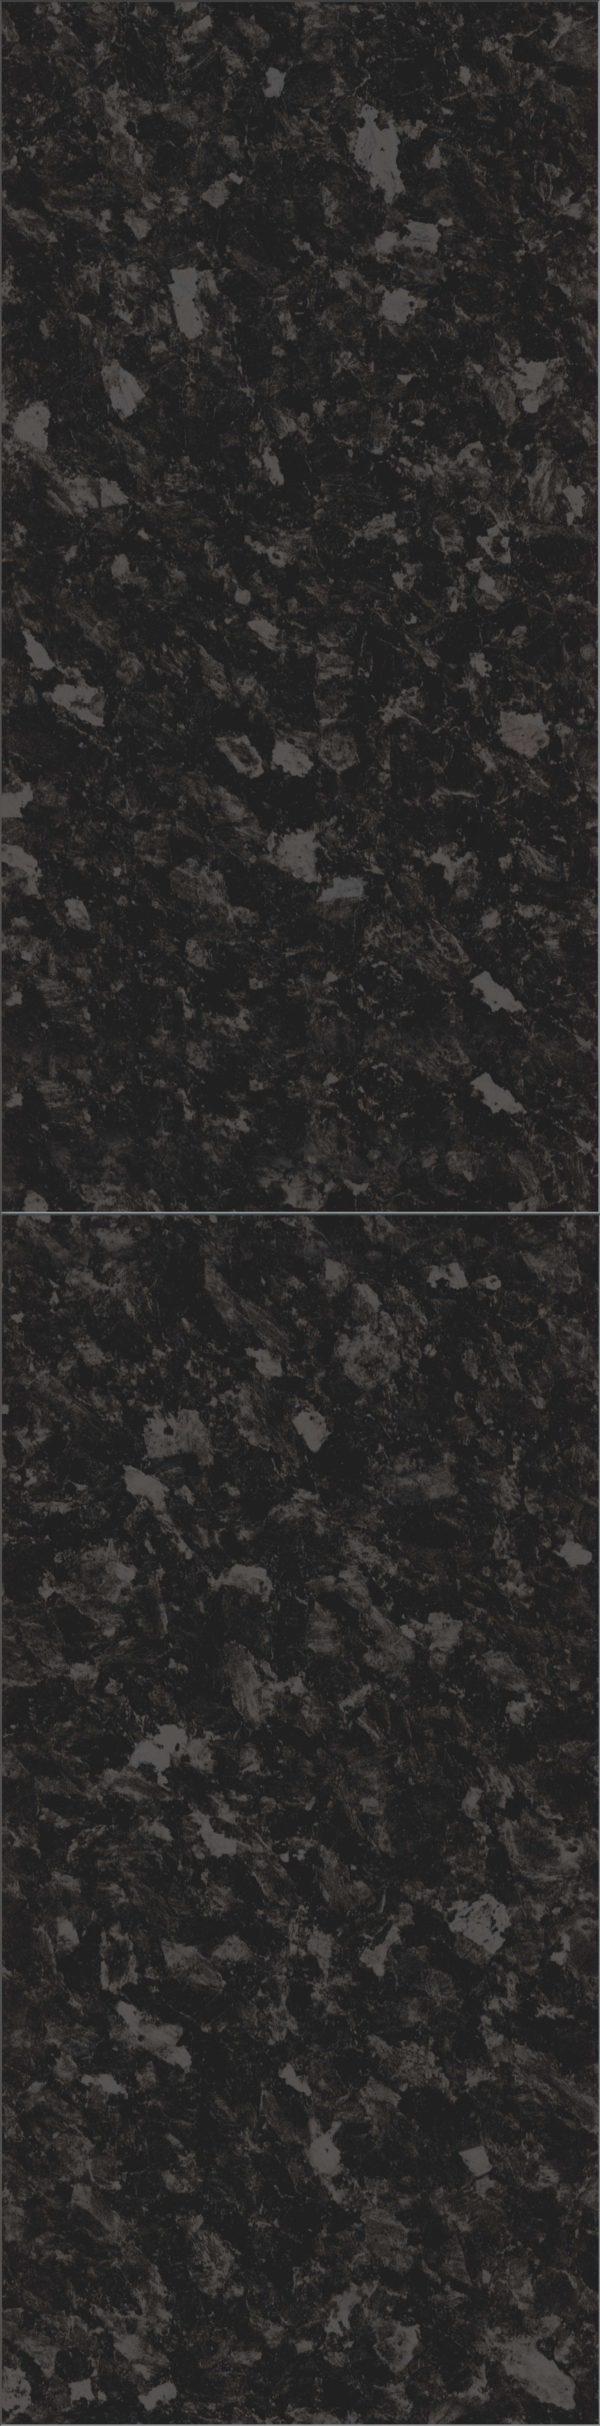 HDM Laminat Brilliant Life Black Pearl 775506-2911